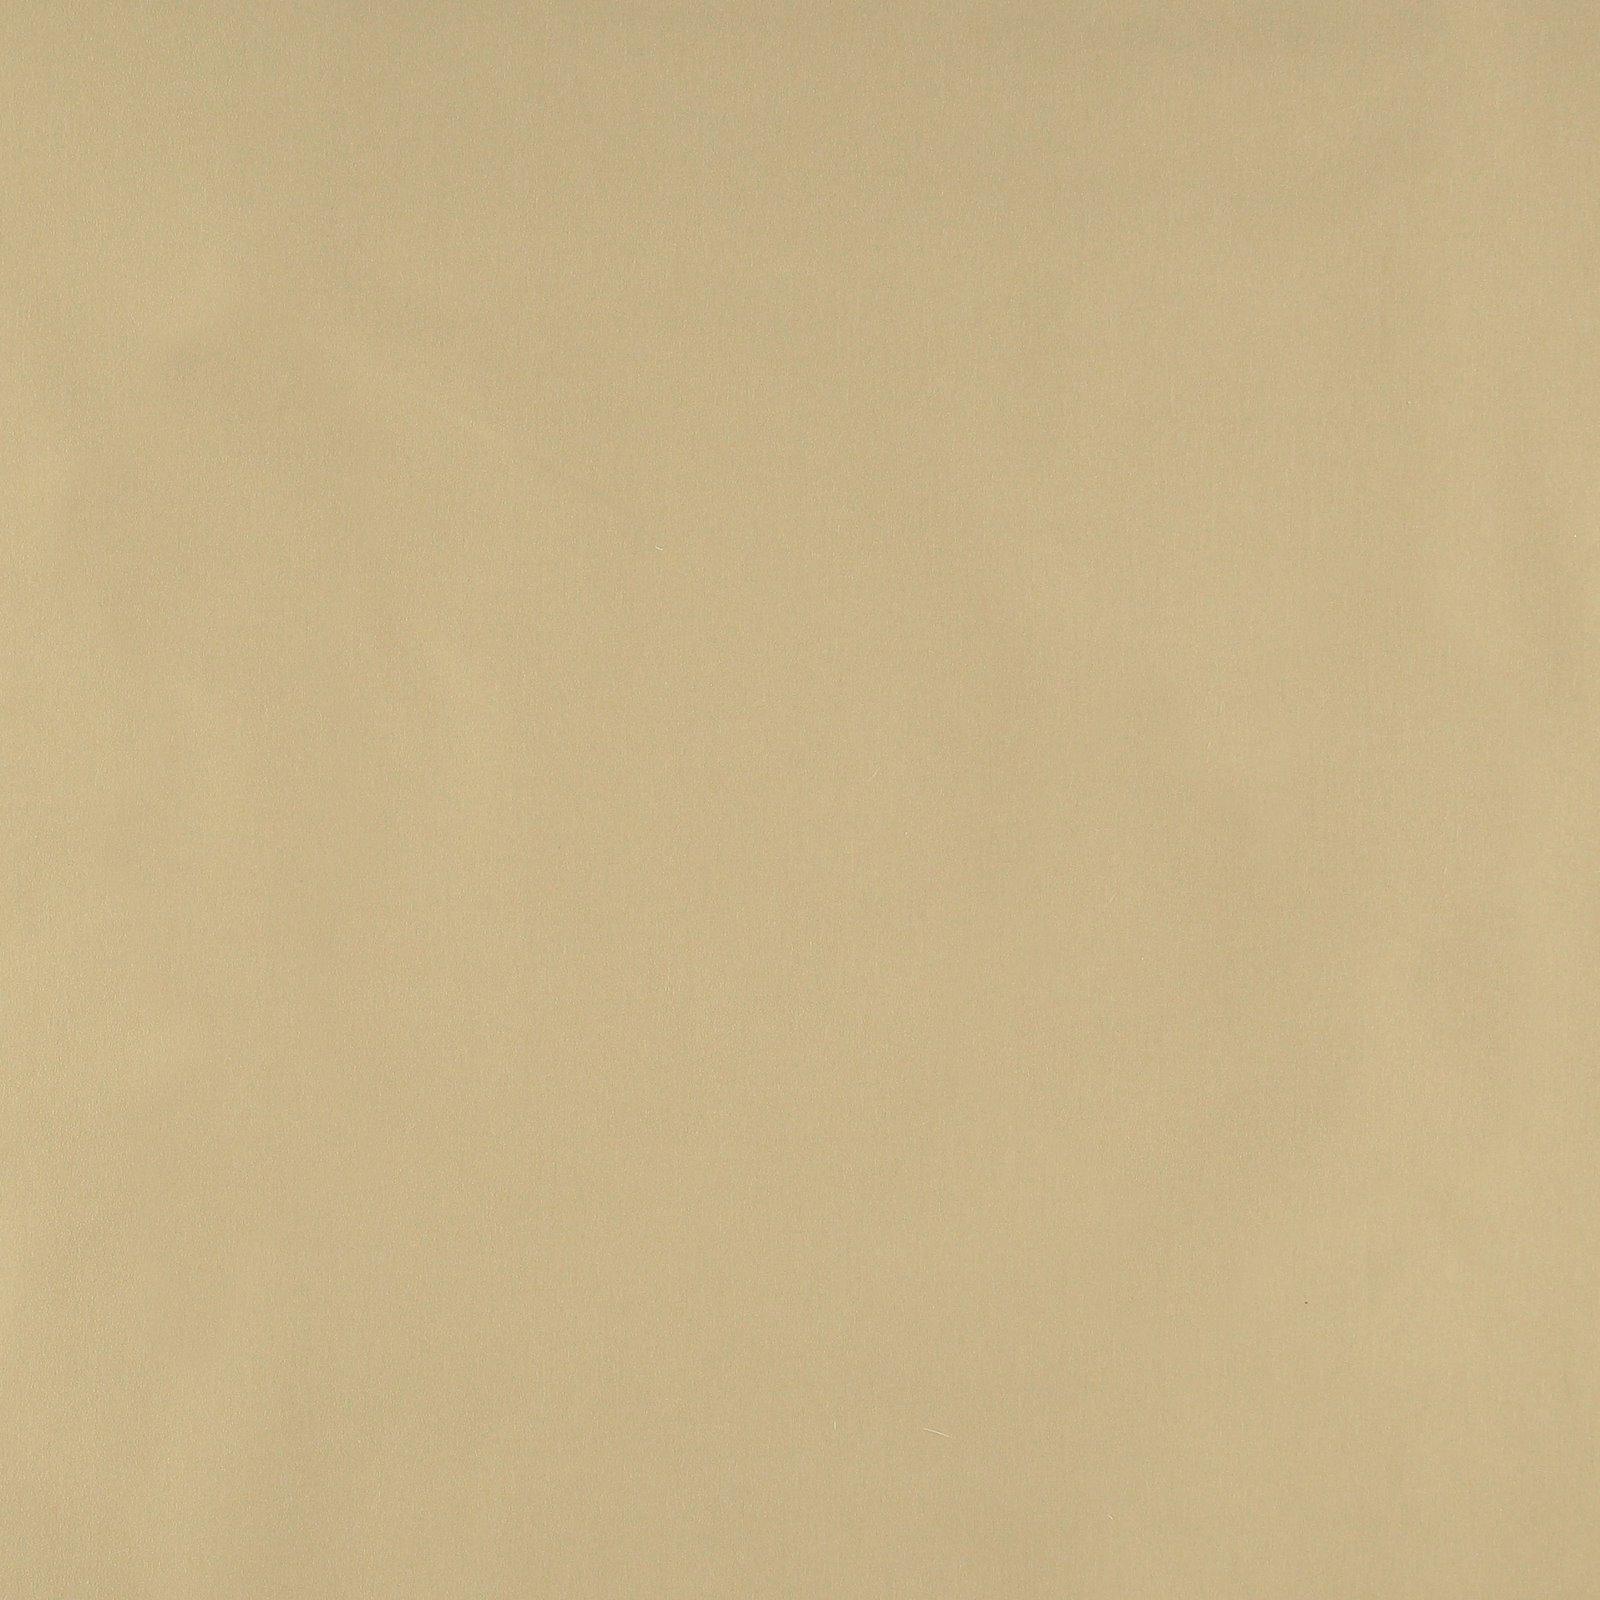 Woven rainwear quality sand 650746_pack_solid